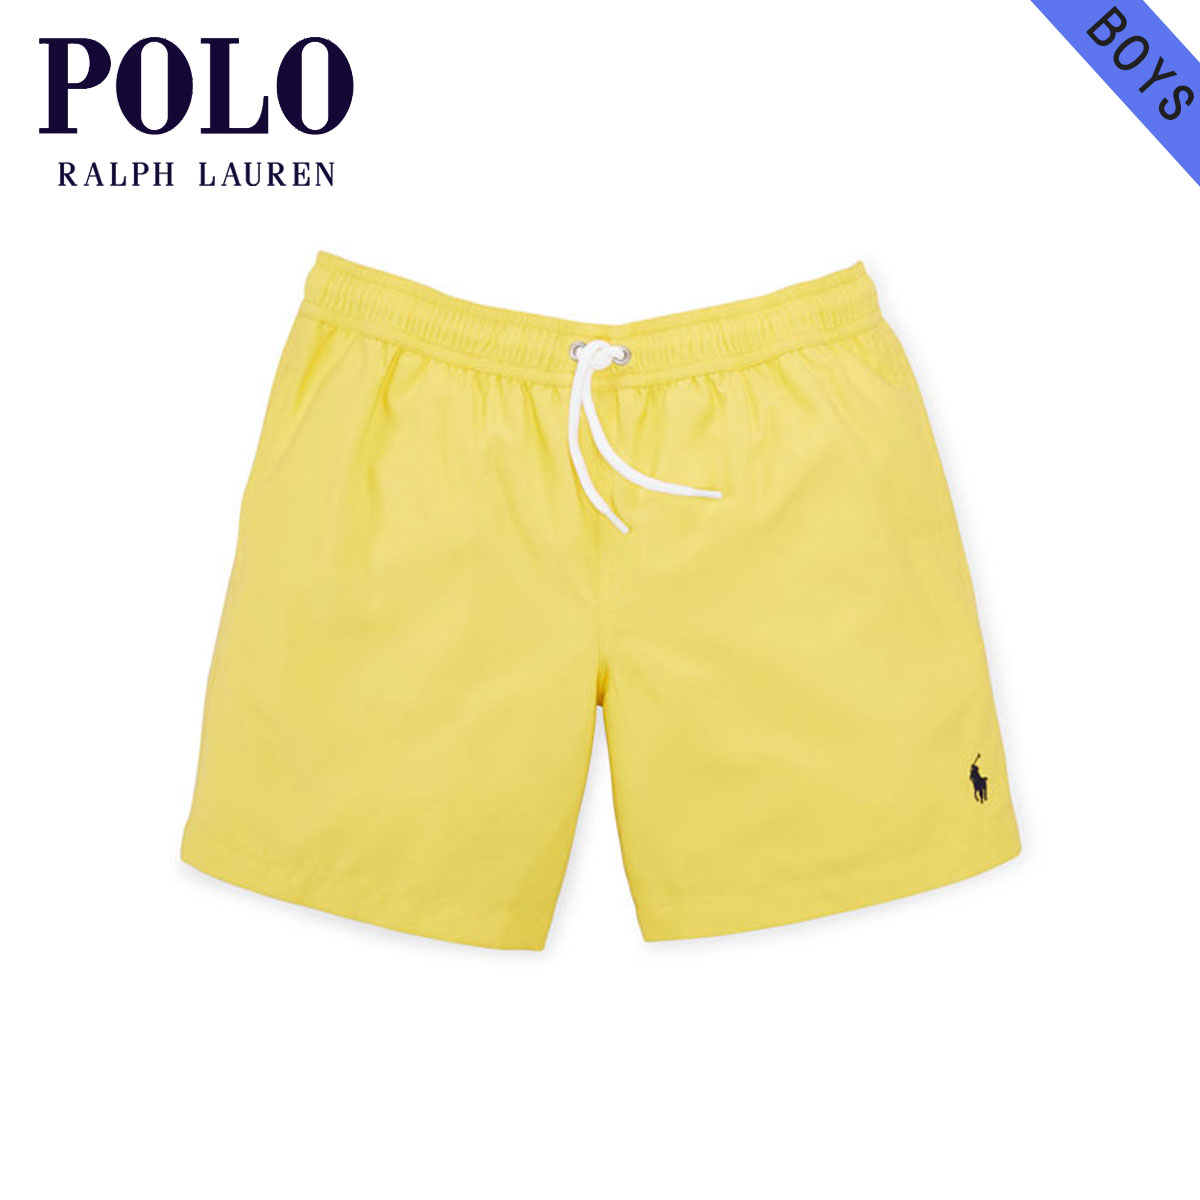 Poloralflorenkids POLO RALPH LAUREN CHILDREN genuine kids clothing boys swim  top swimsuit HAWAIIAN SWIM TRUNK 88638376